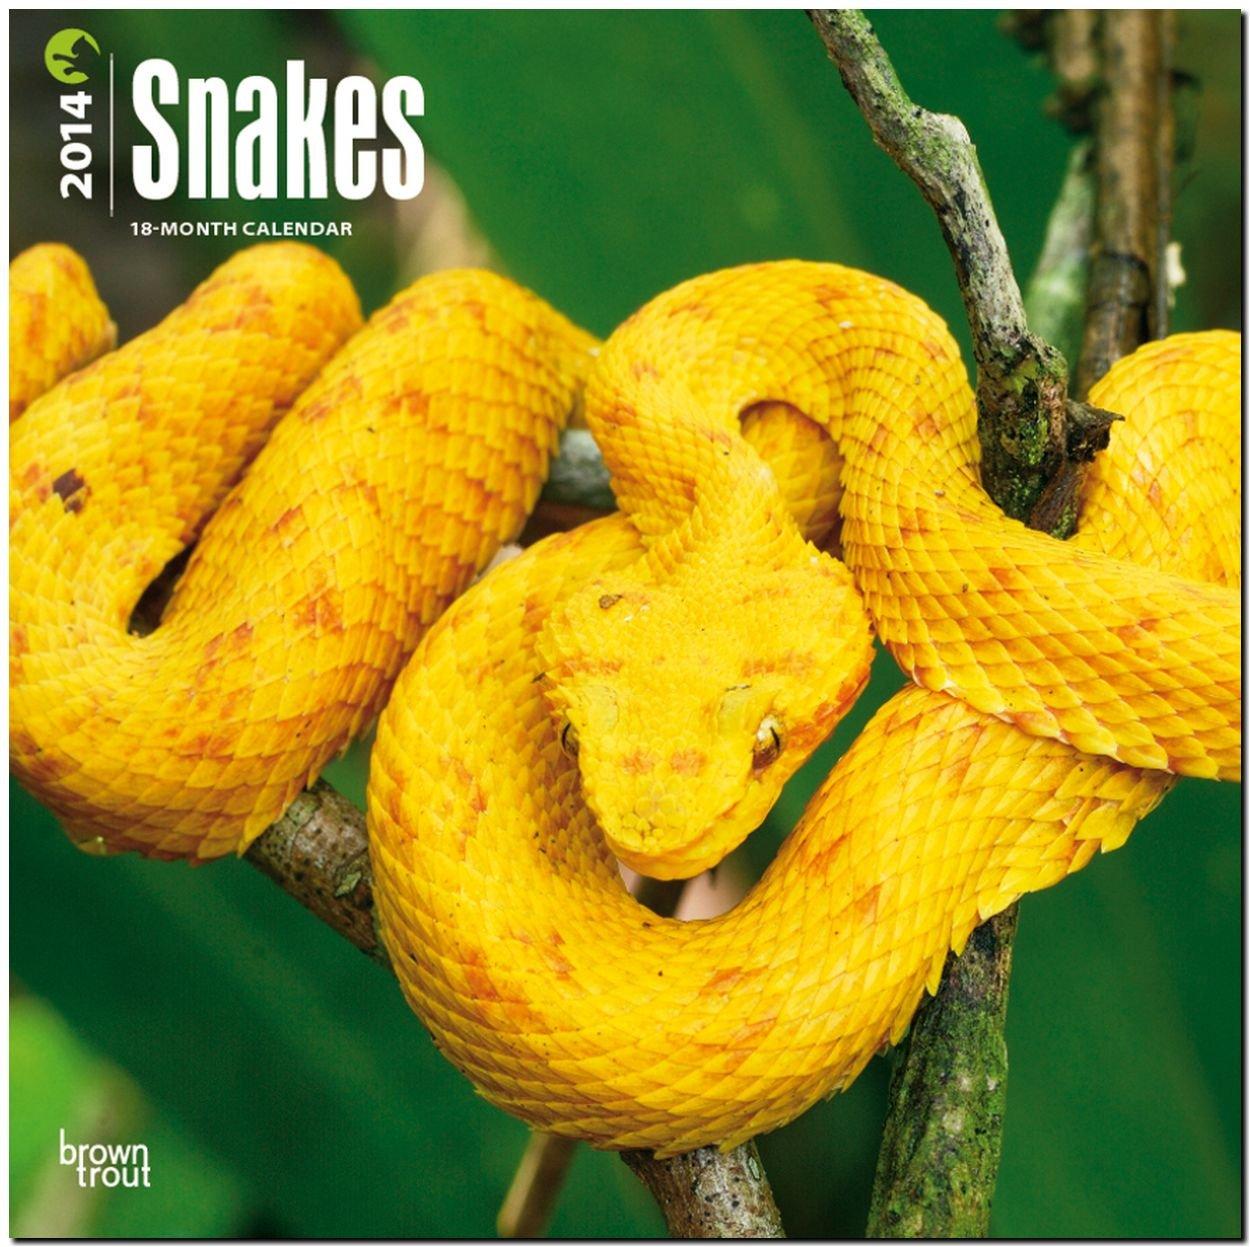 Snakes 2014 - Schlangen: Original BrownTrout-Kalender [Mehrsprachig] [Kalender]